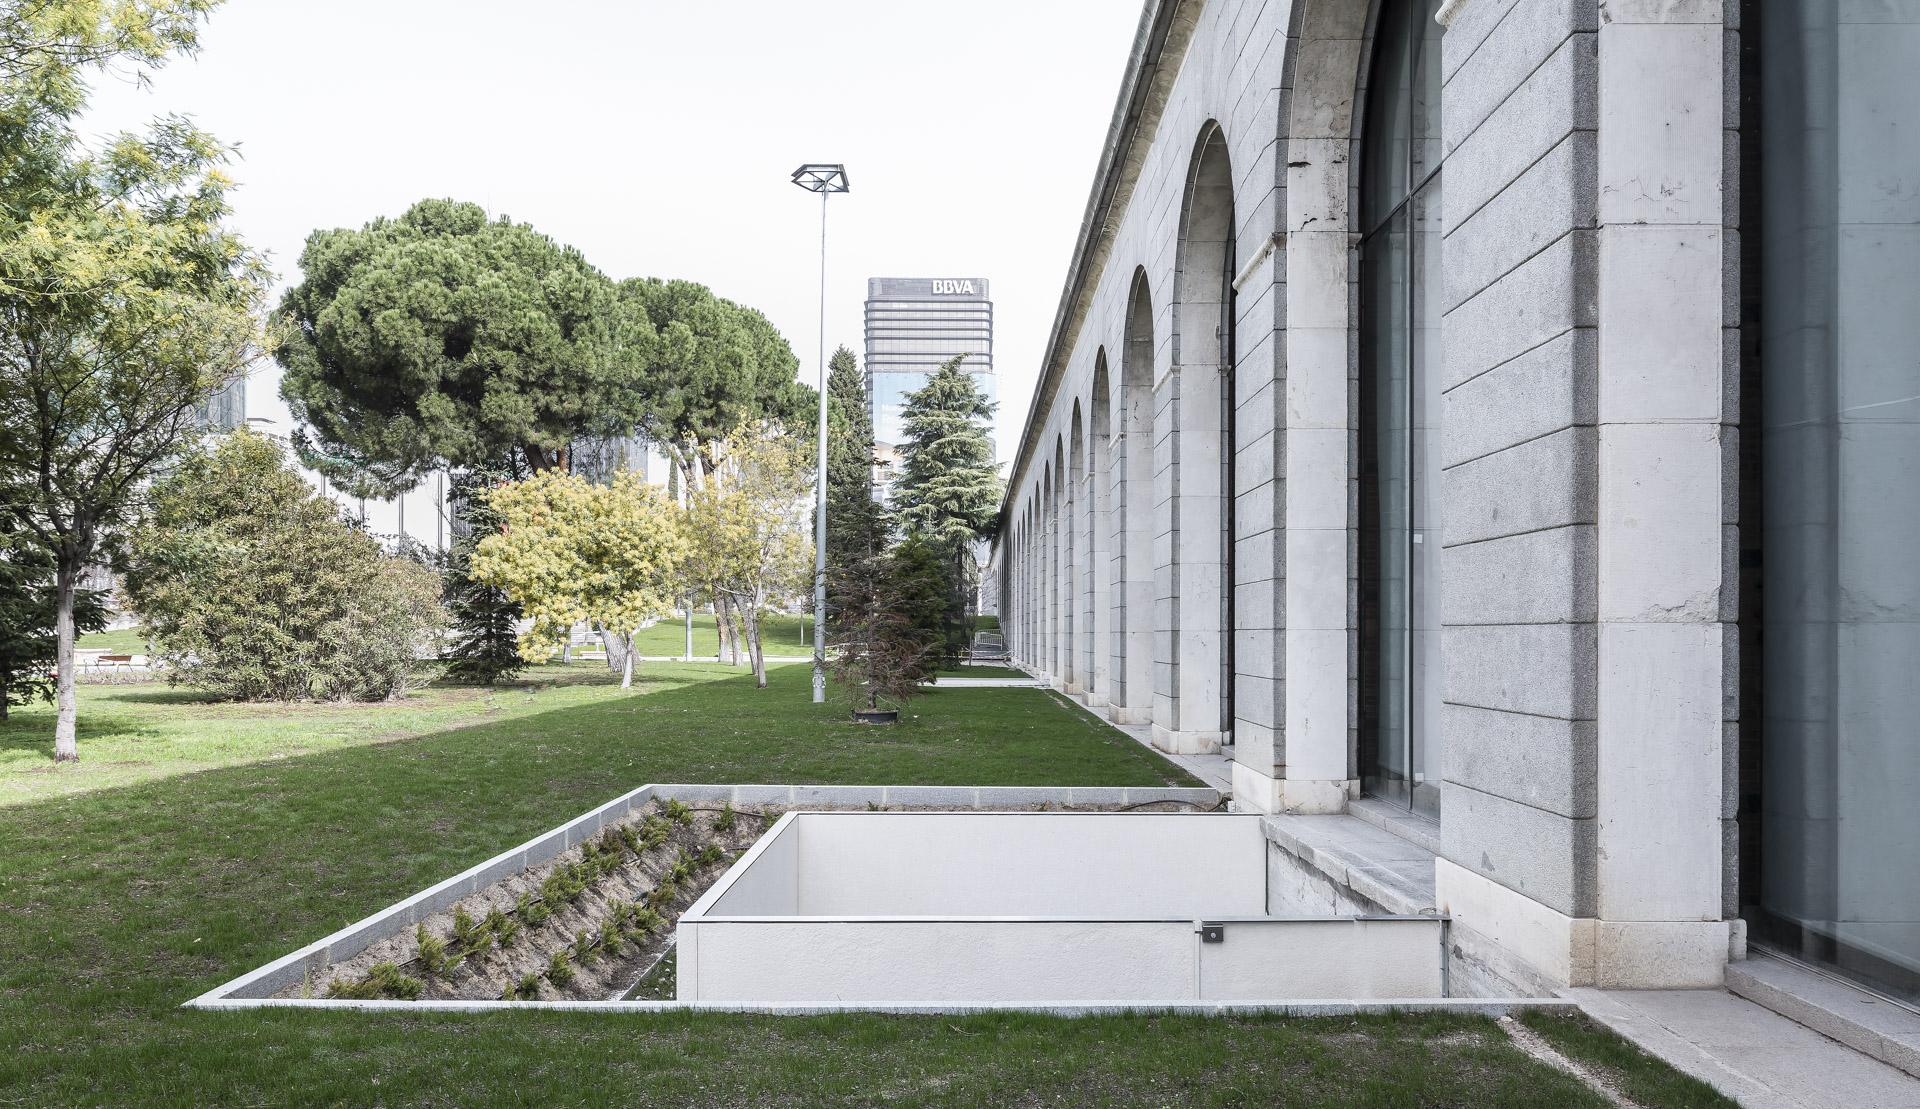 fotografia-arquitectura-madrid-nuevos-ministerios-elorza-german-cabo-03